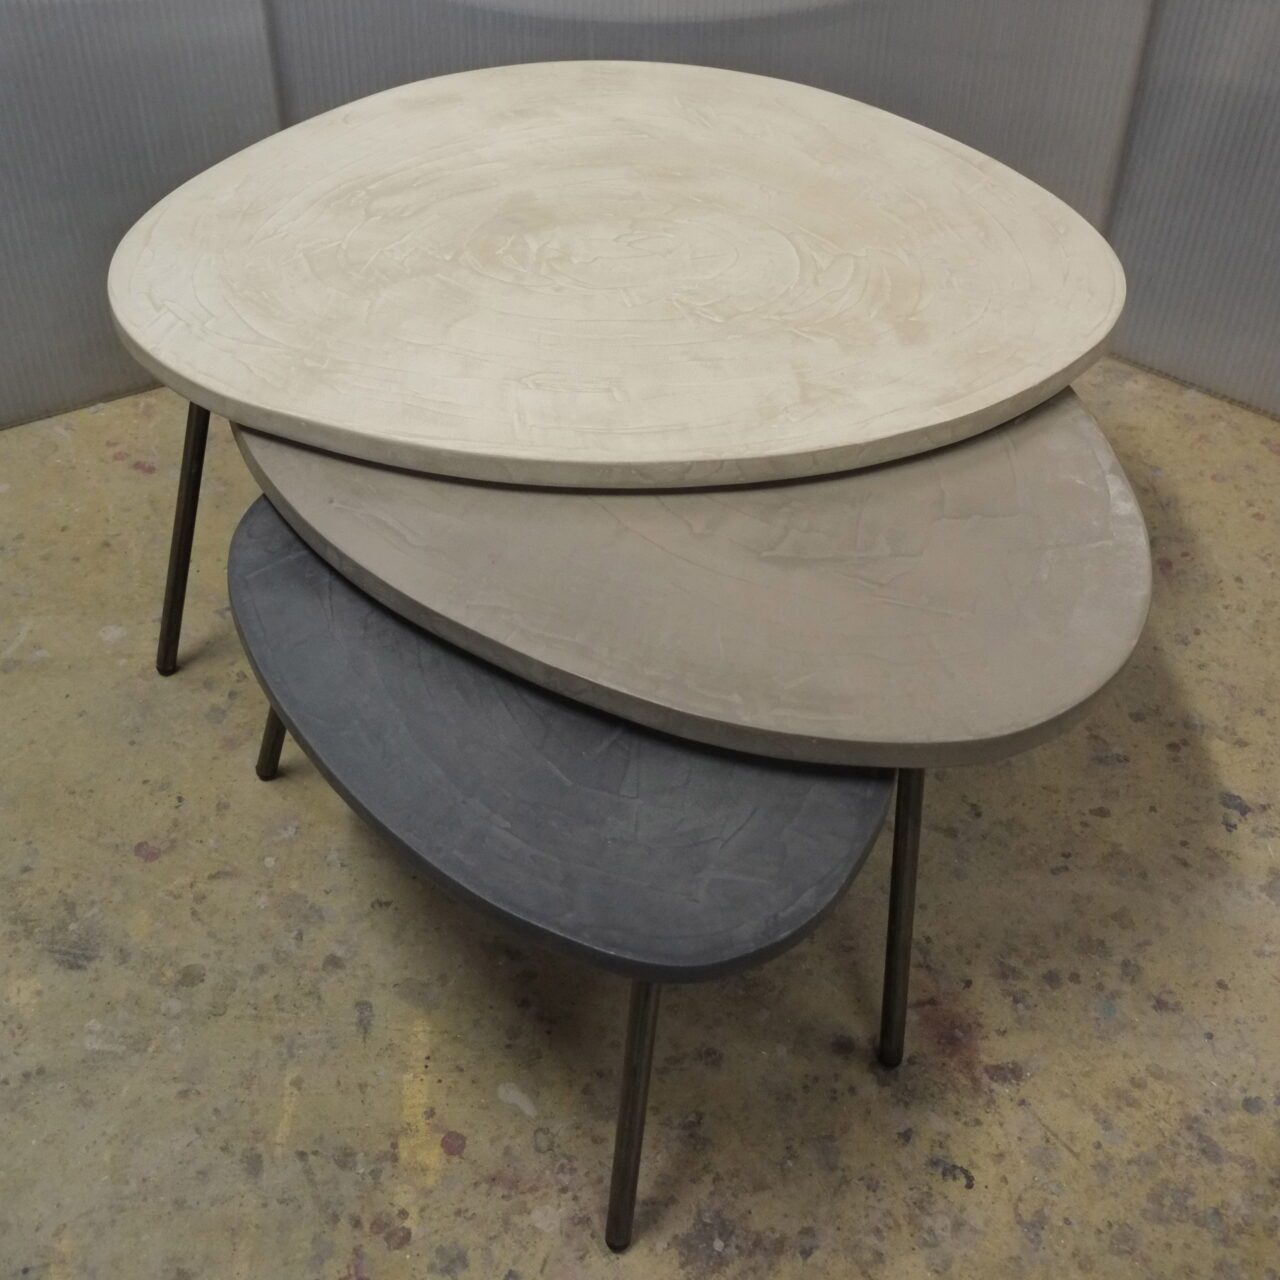 table basse design italien karedesign table basse bar croco colonial kare design with table. Black Bedroom Furniture Sets. Home Design Ideas